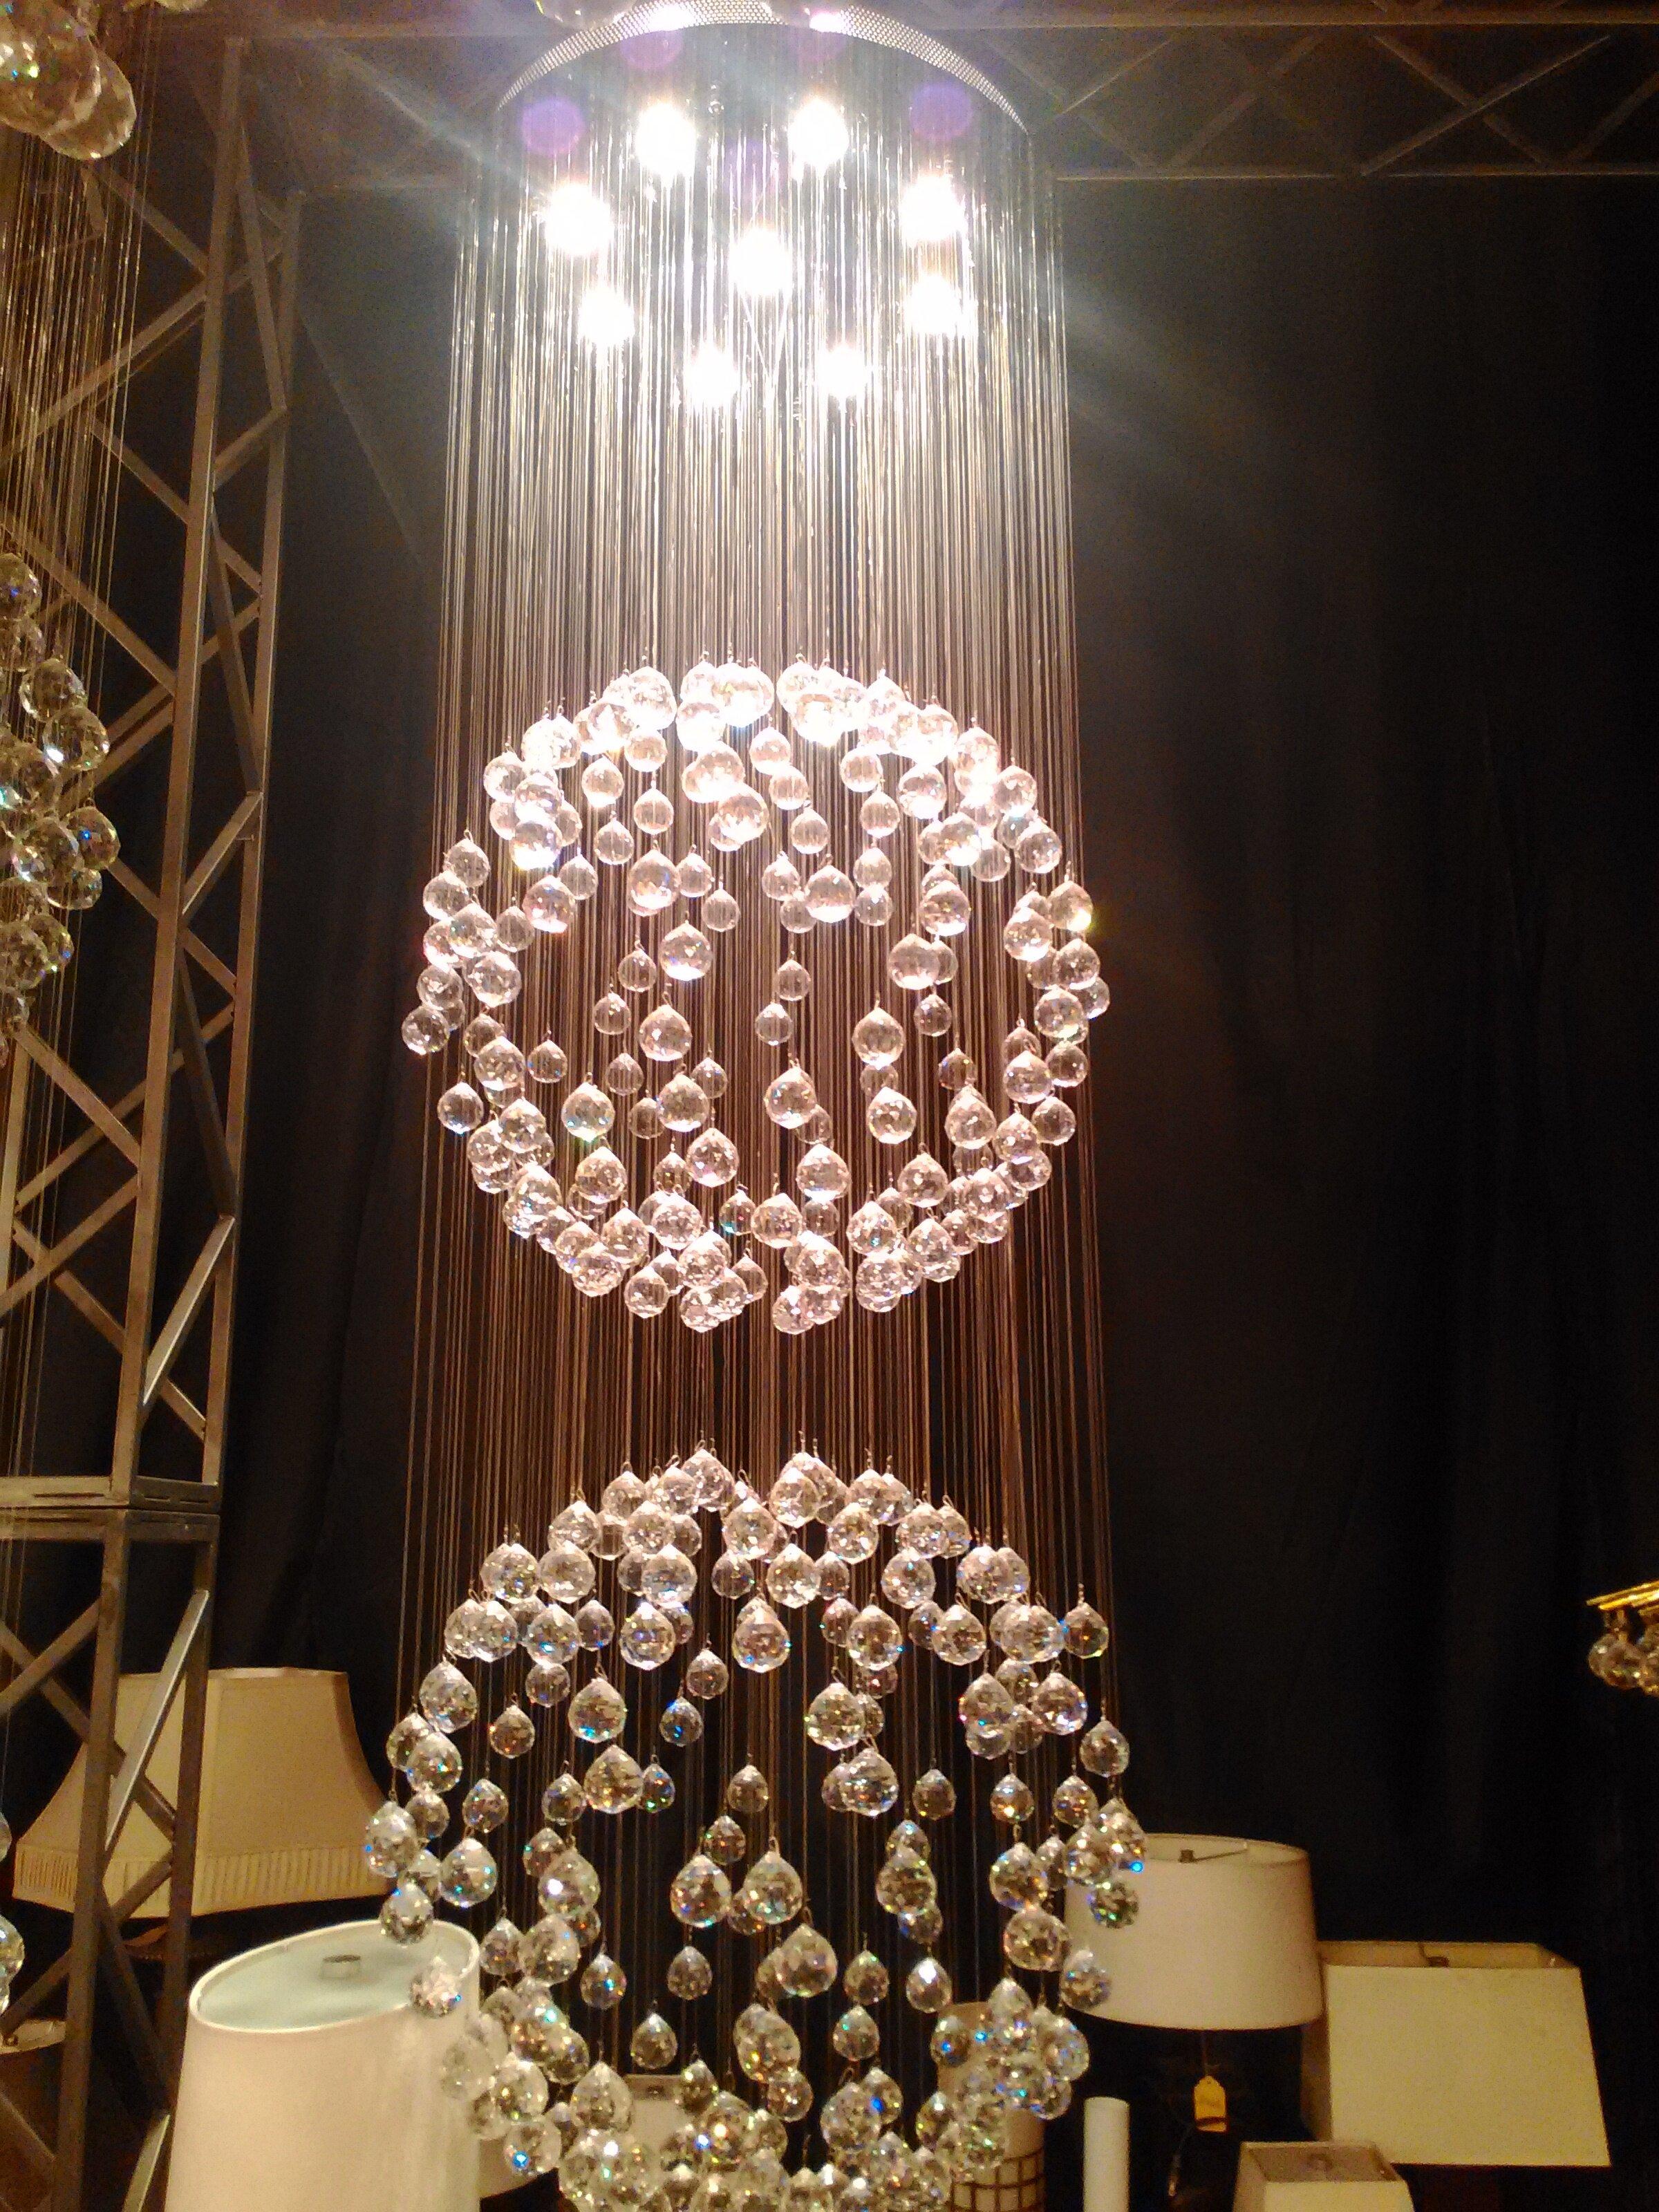 Orren Ellis Latrobe Contemporary 9-Light Chandelier | Wayfair